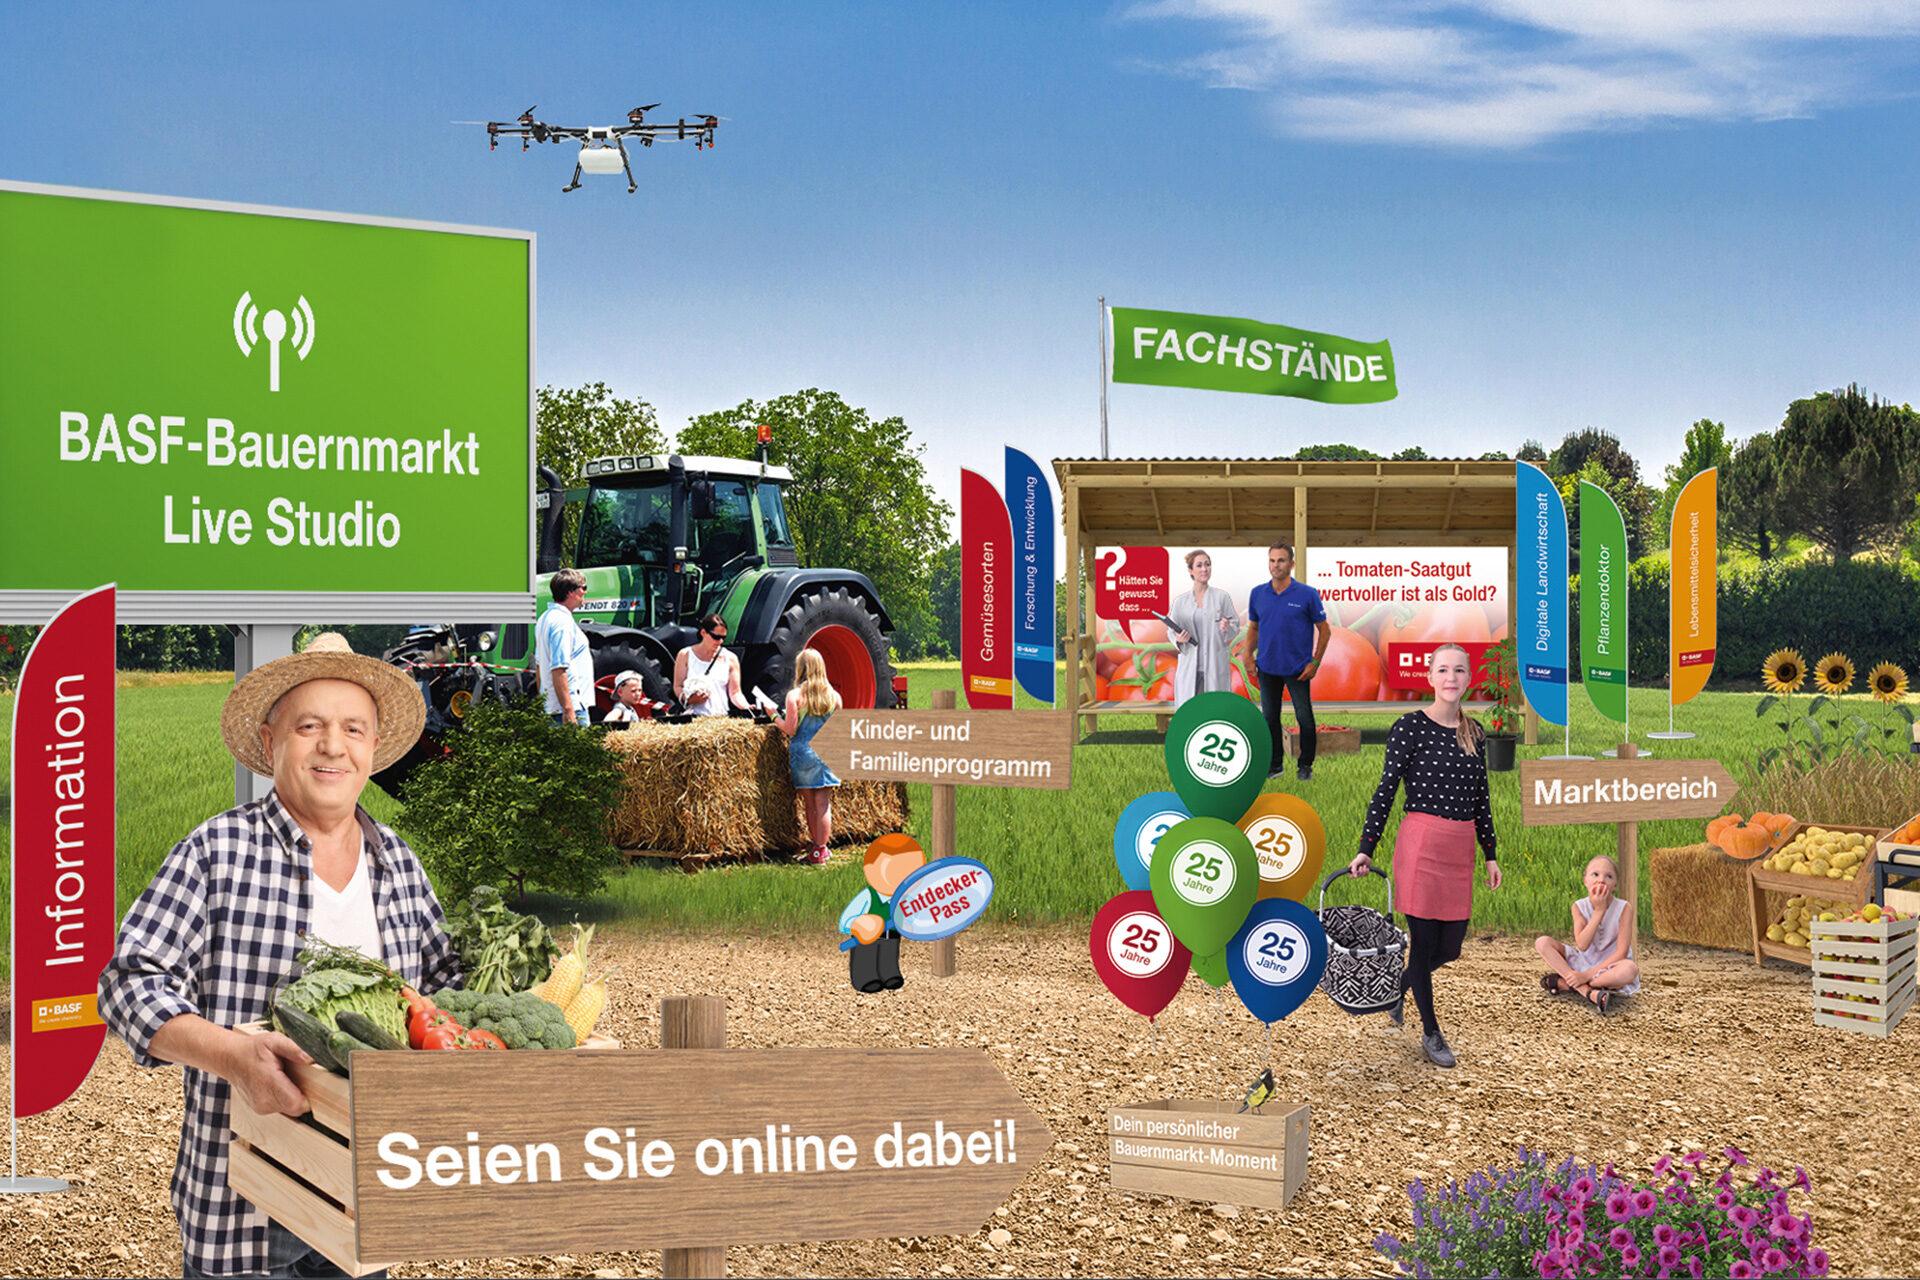 Agentur Ressmann | Expo IP 2